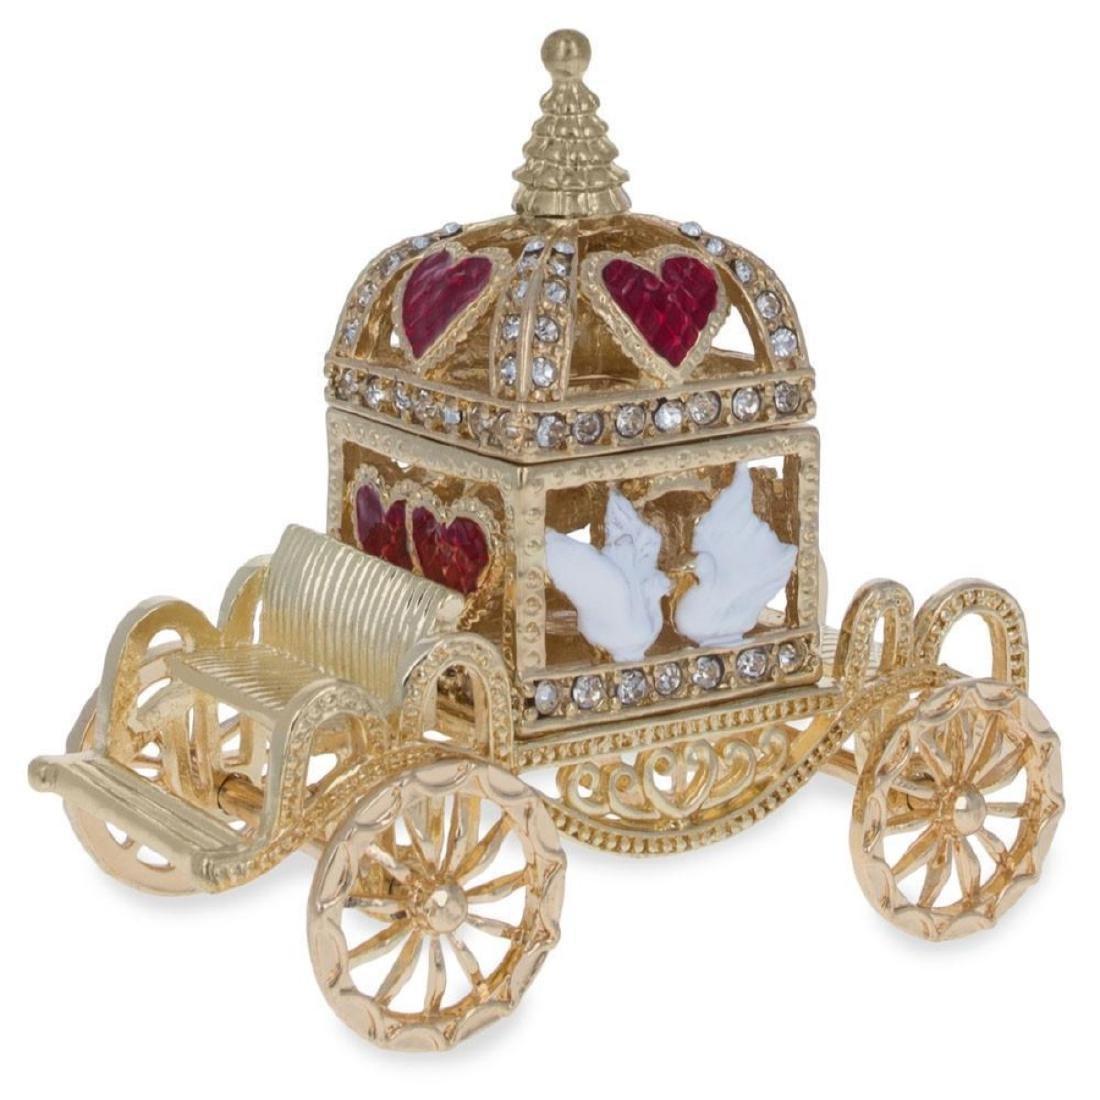 Royal Coronation Coach with Doves Trinket Box Figurine